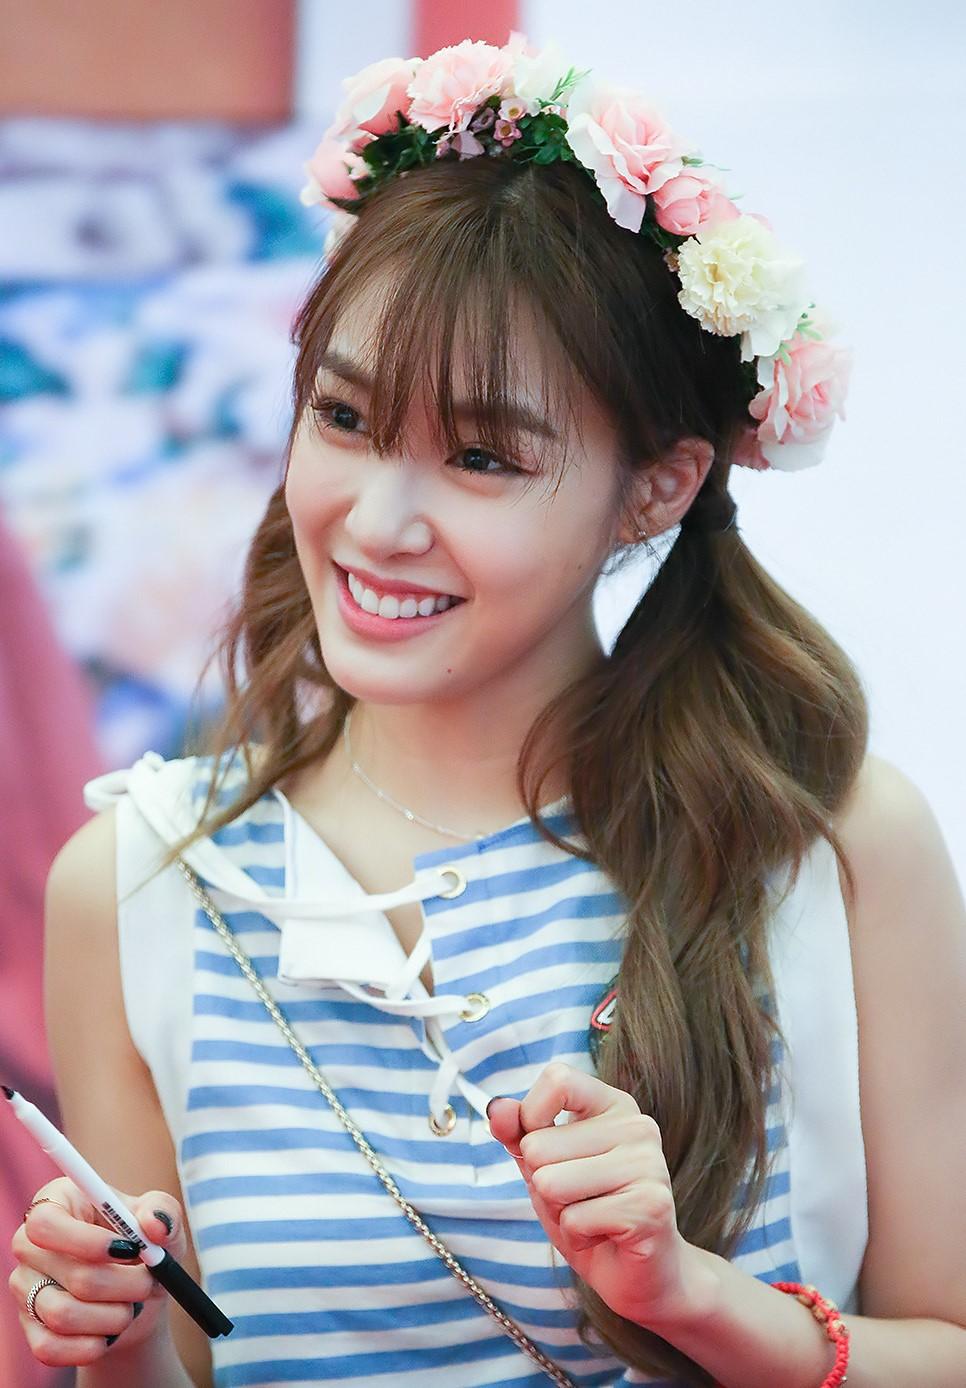 Girls Generation Tiffany Wallpaper File Tiffany Hwang At A Fansigning In Busan In June 2016